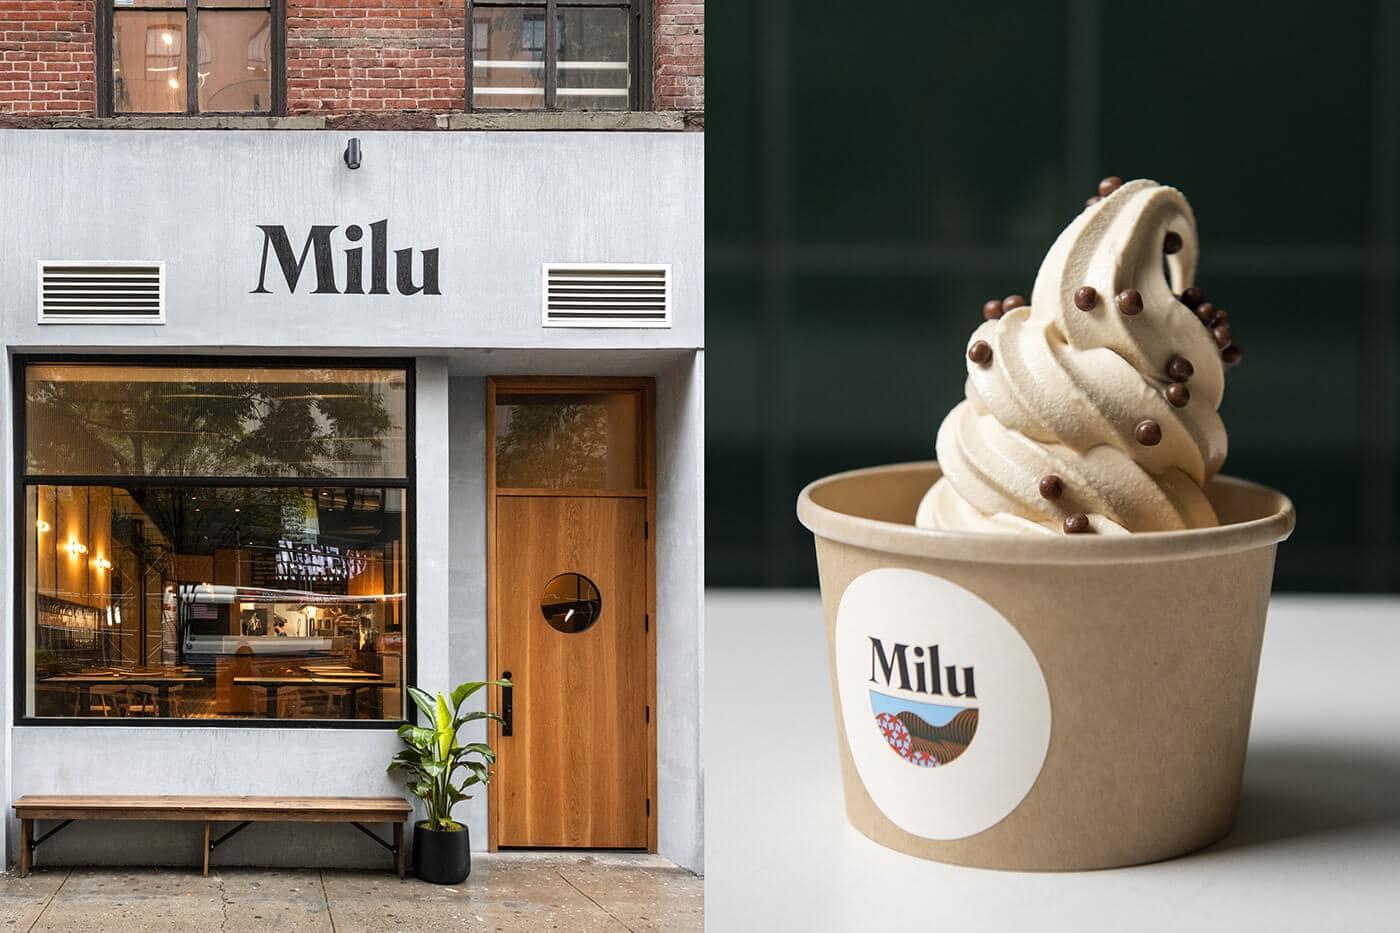 Milu | Chinese Restaurant in New York, NY